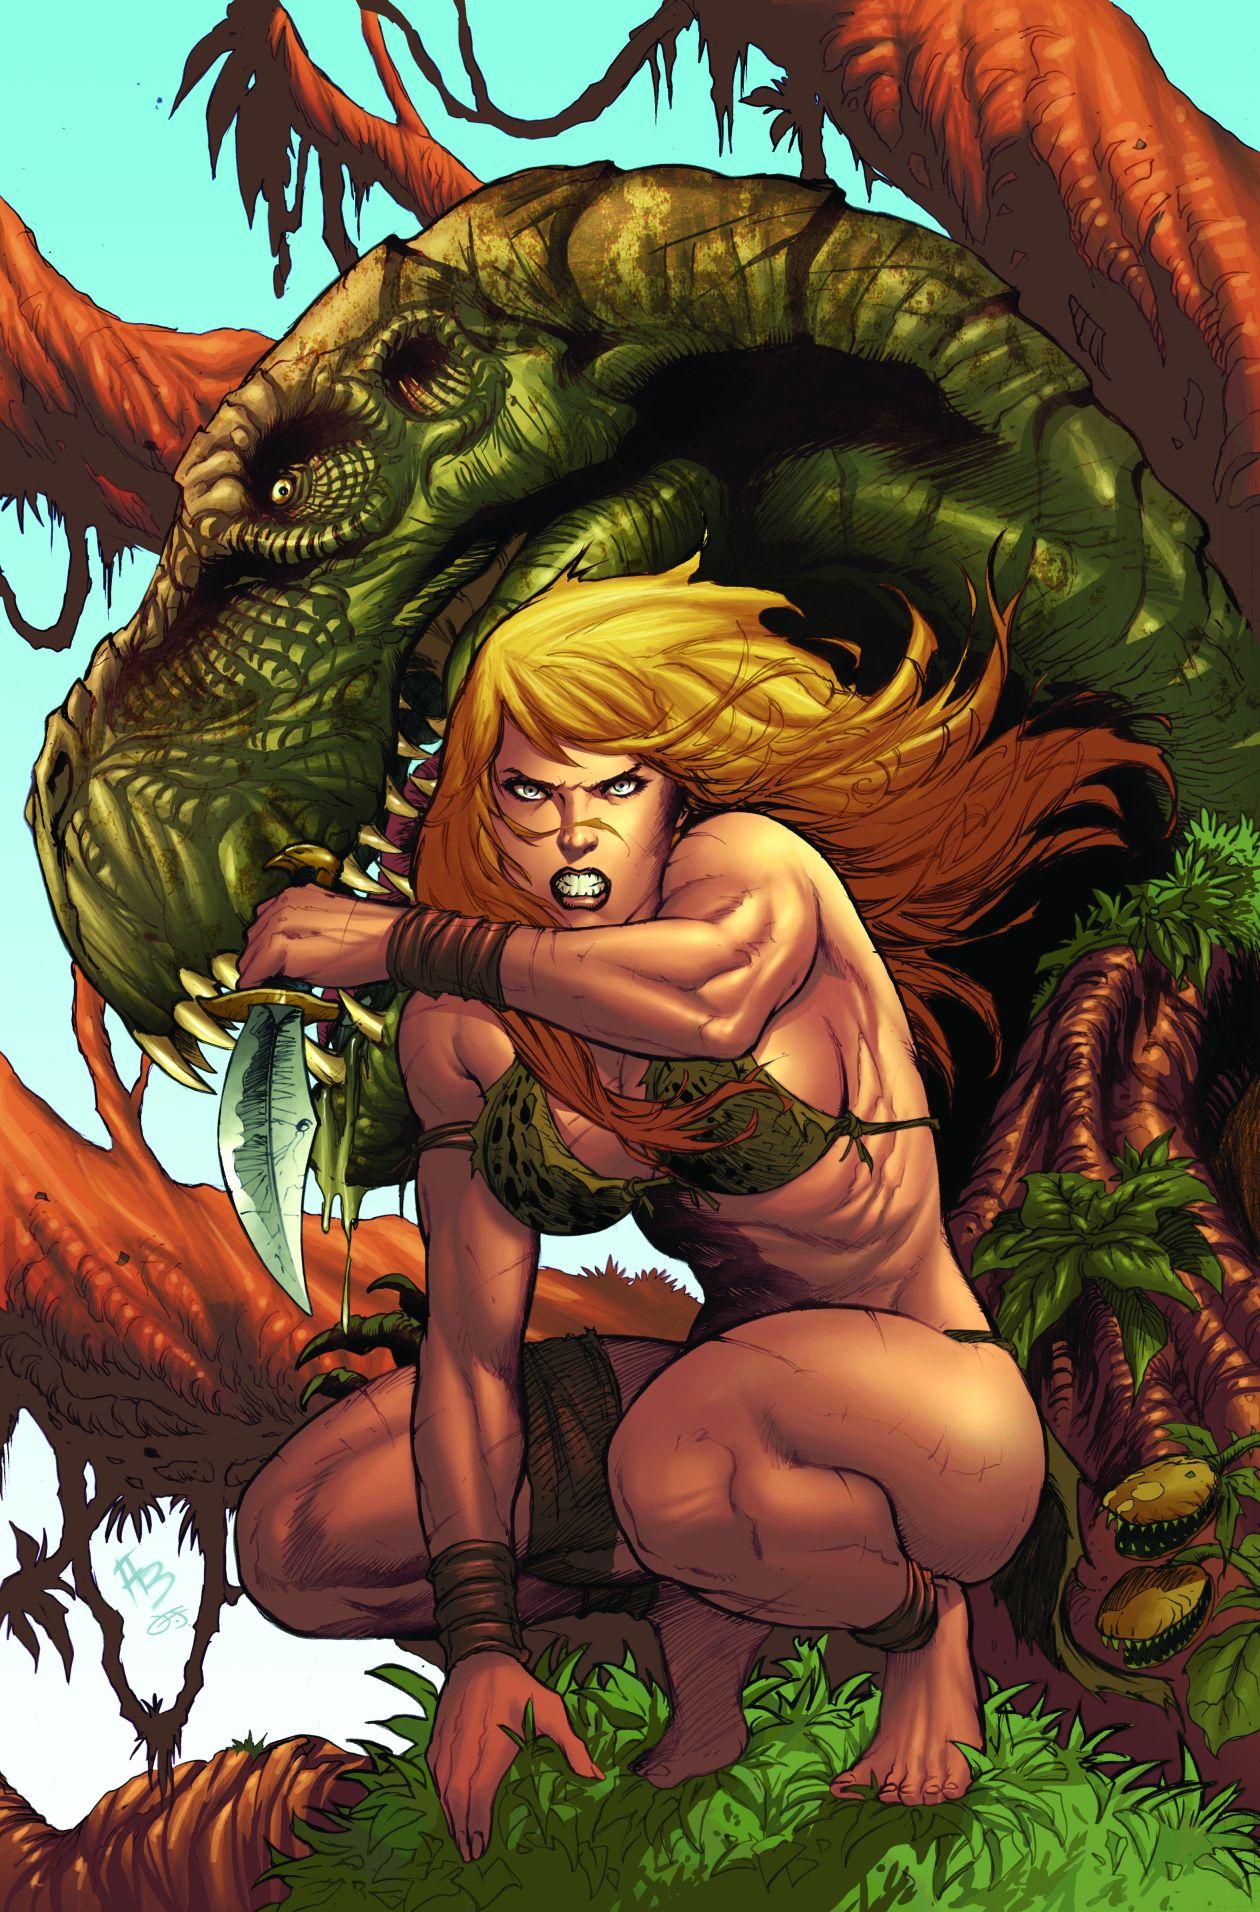 [Gentle Giant] Marvel Comics: Shanna 1/4 - Página 2 Jungle_girl_5_by_adrianohq-d1aq64u